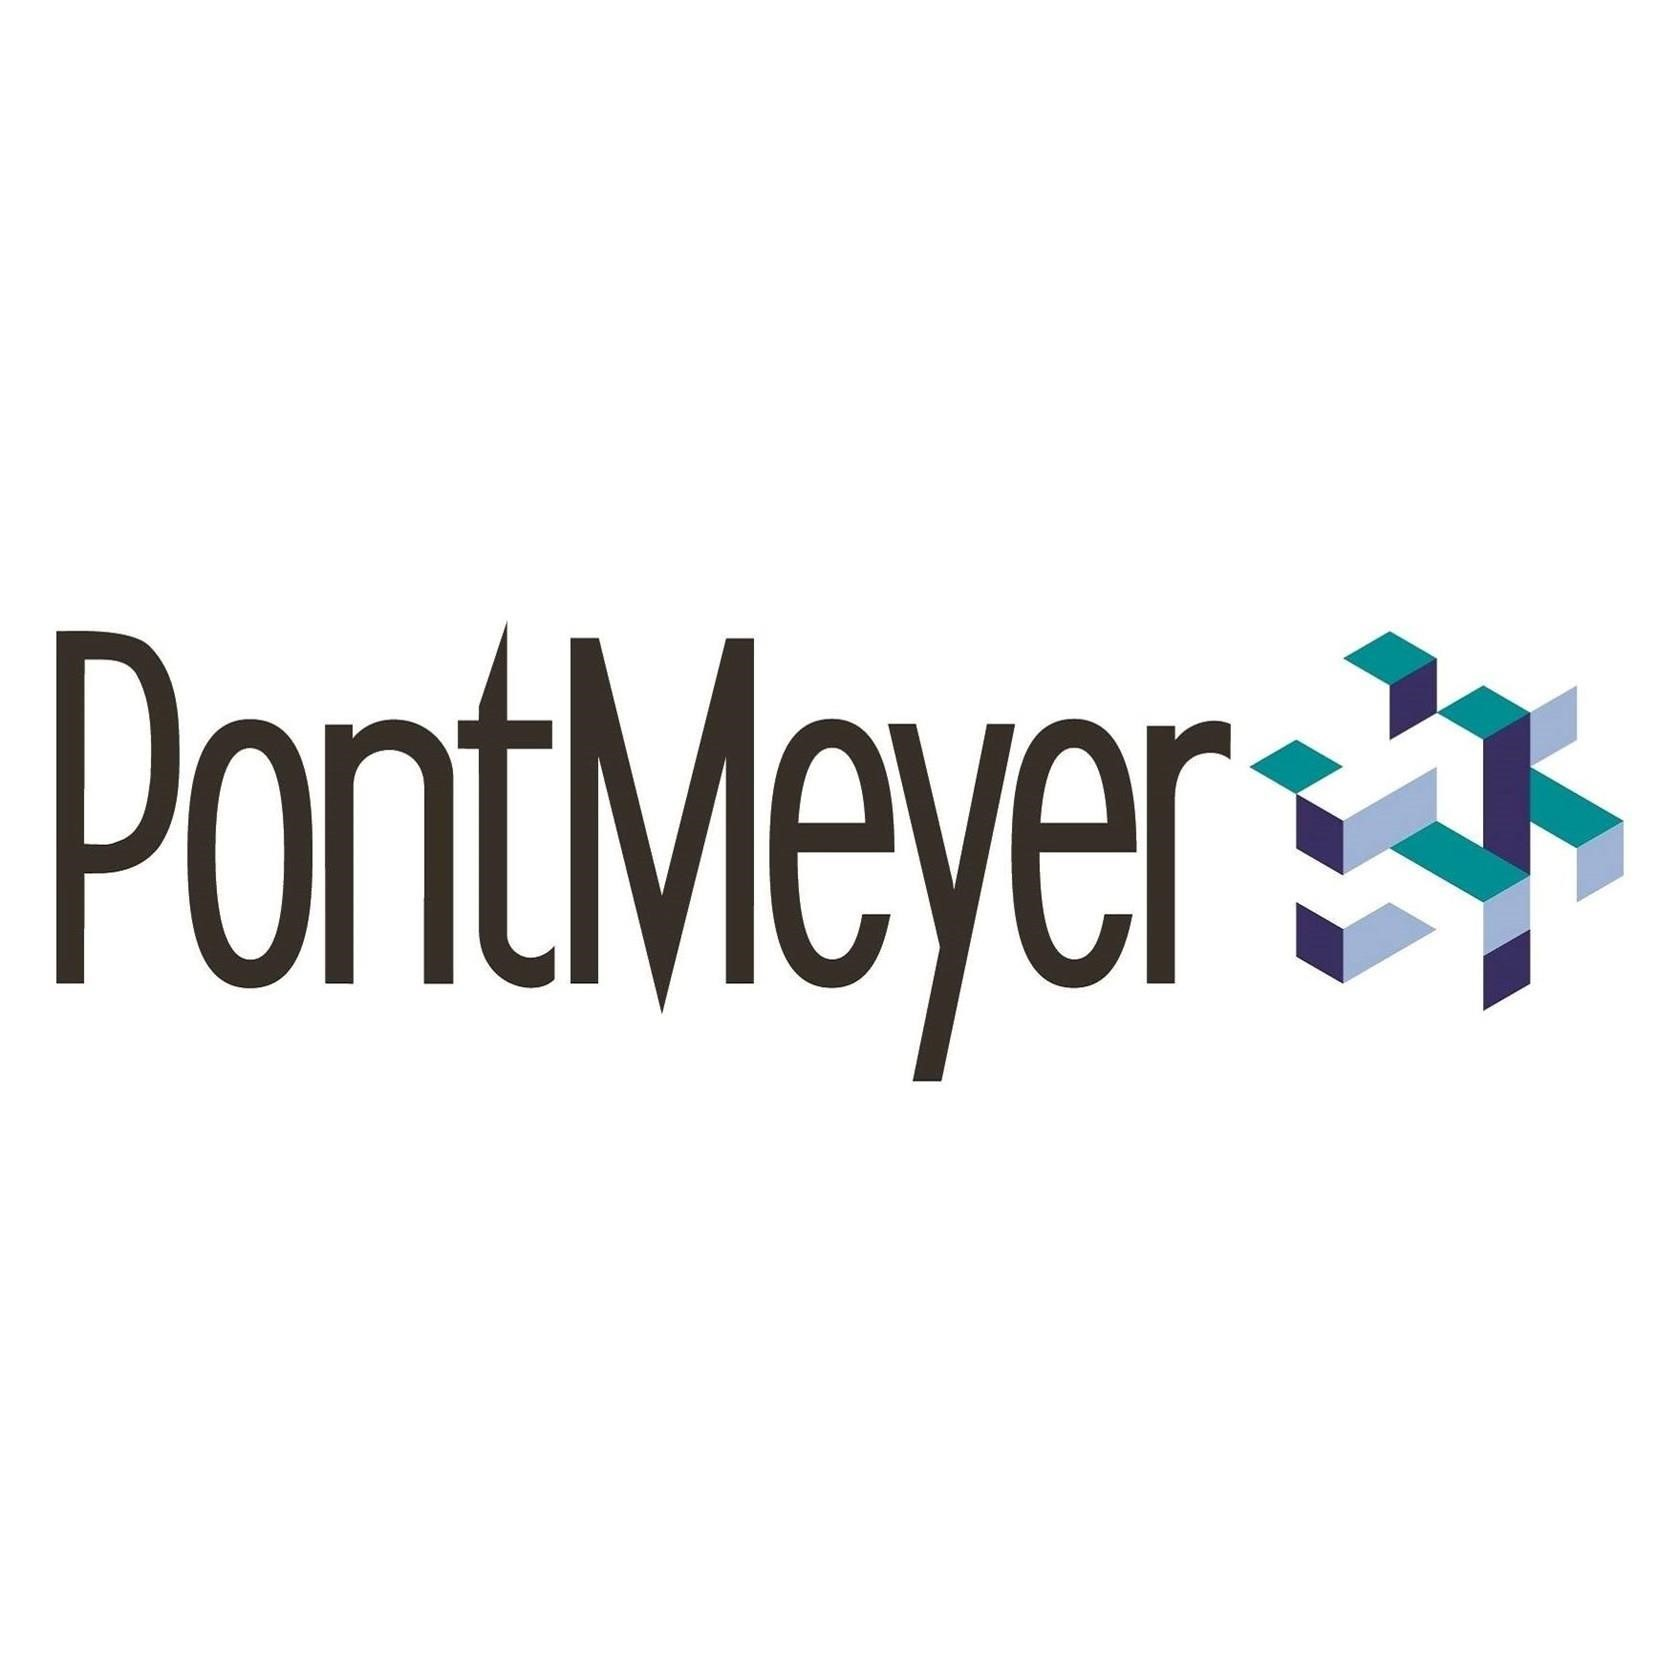 Pontmeyer logo